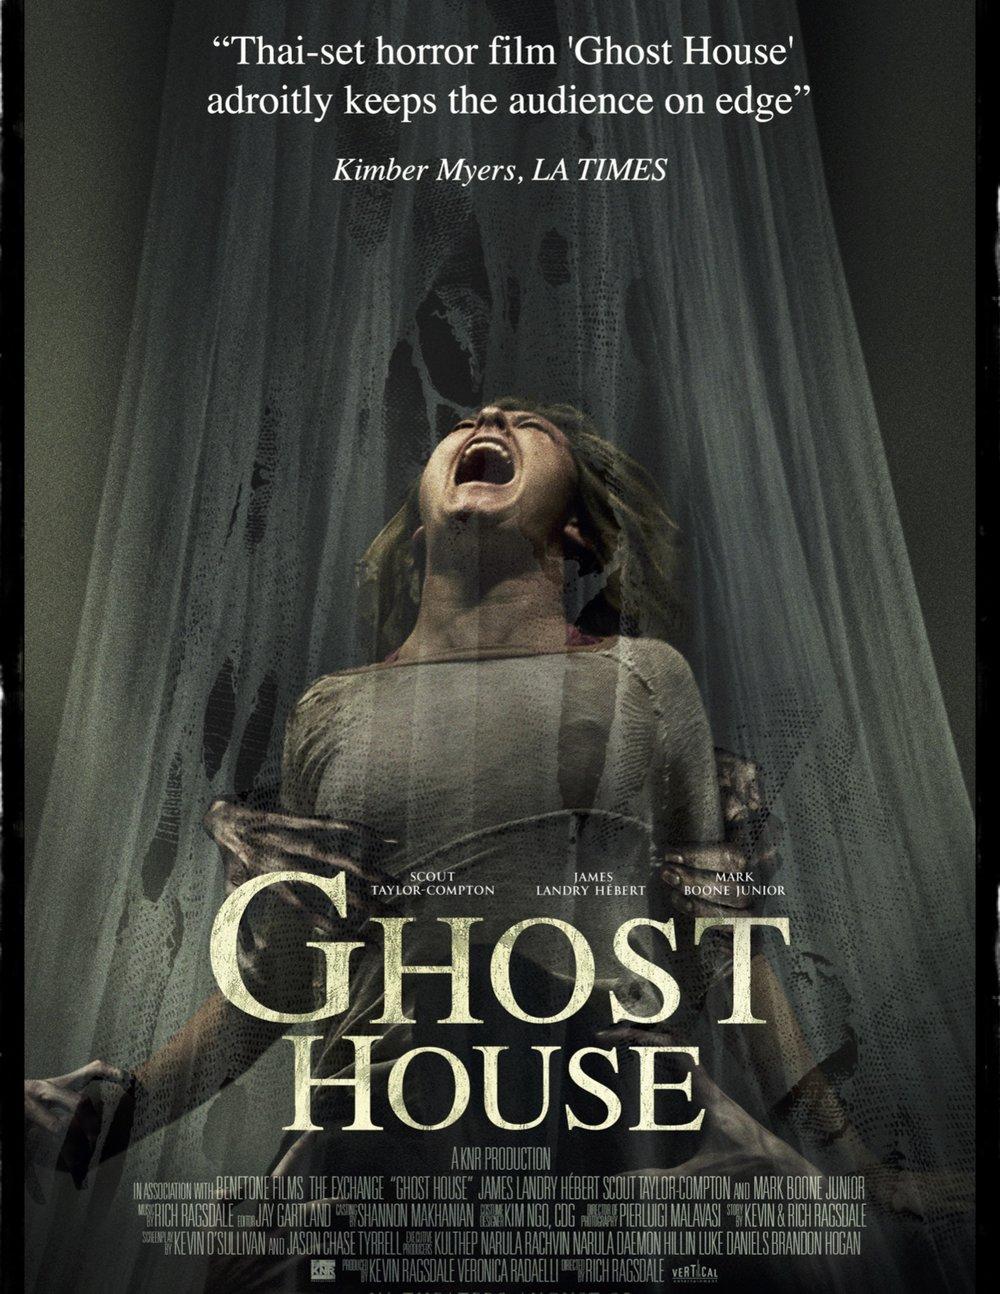 GHOST HOUSE poster.jpg